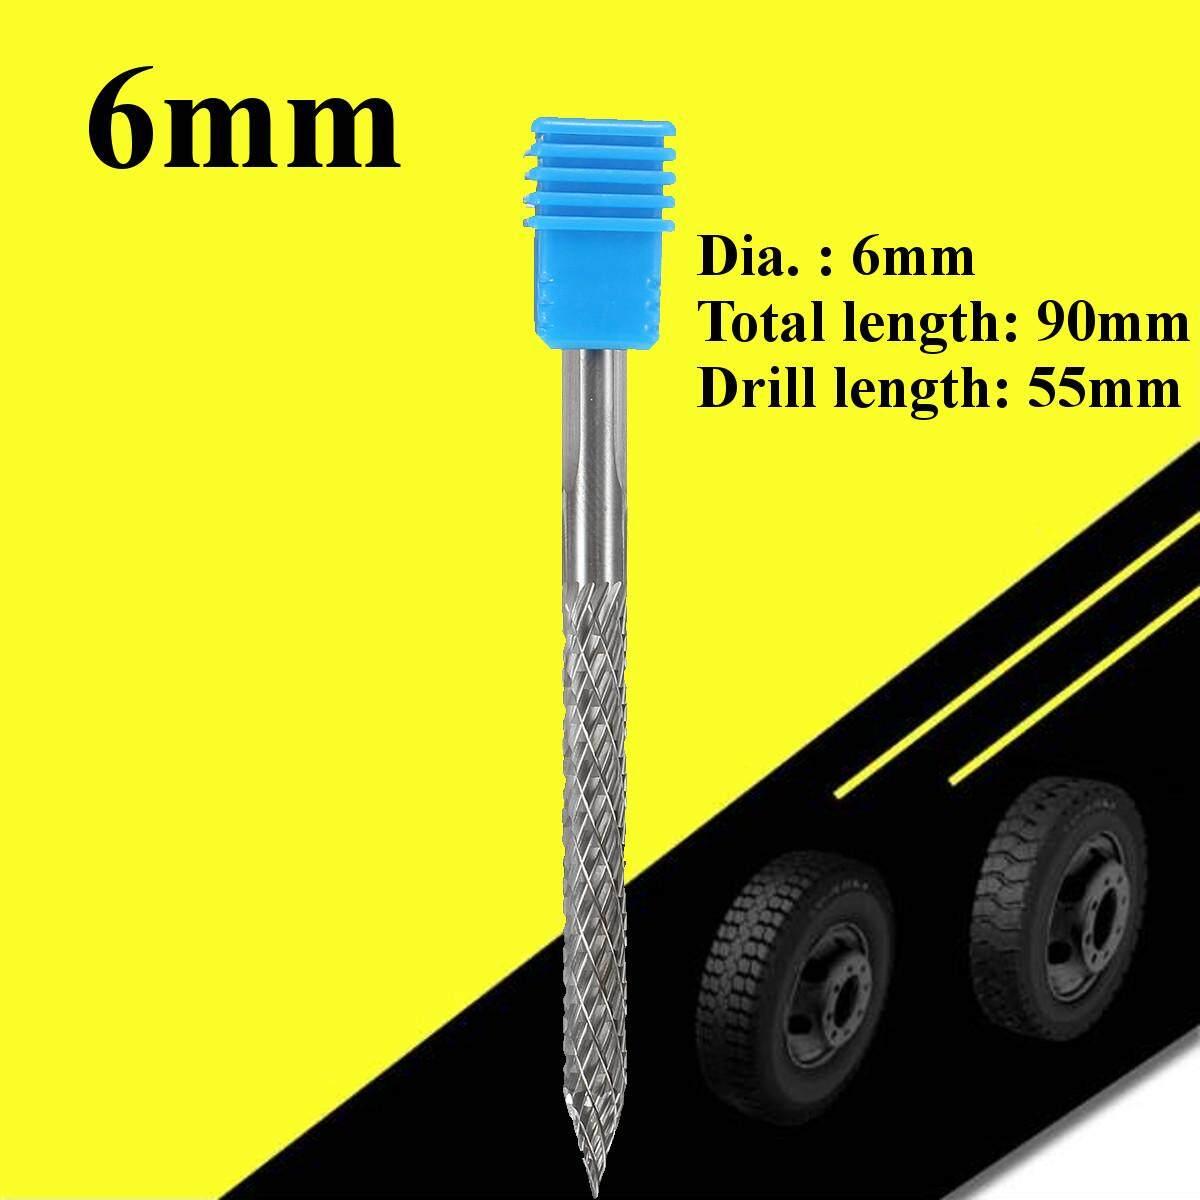 Lốp Lưỡi Cắt Hợp Kim Dụng Cụ Máy Khoan Có Ngăn 1/4 6mm Bit Cao Carbide Burr By Autoleader